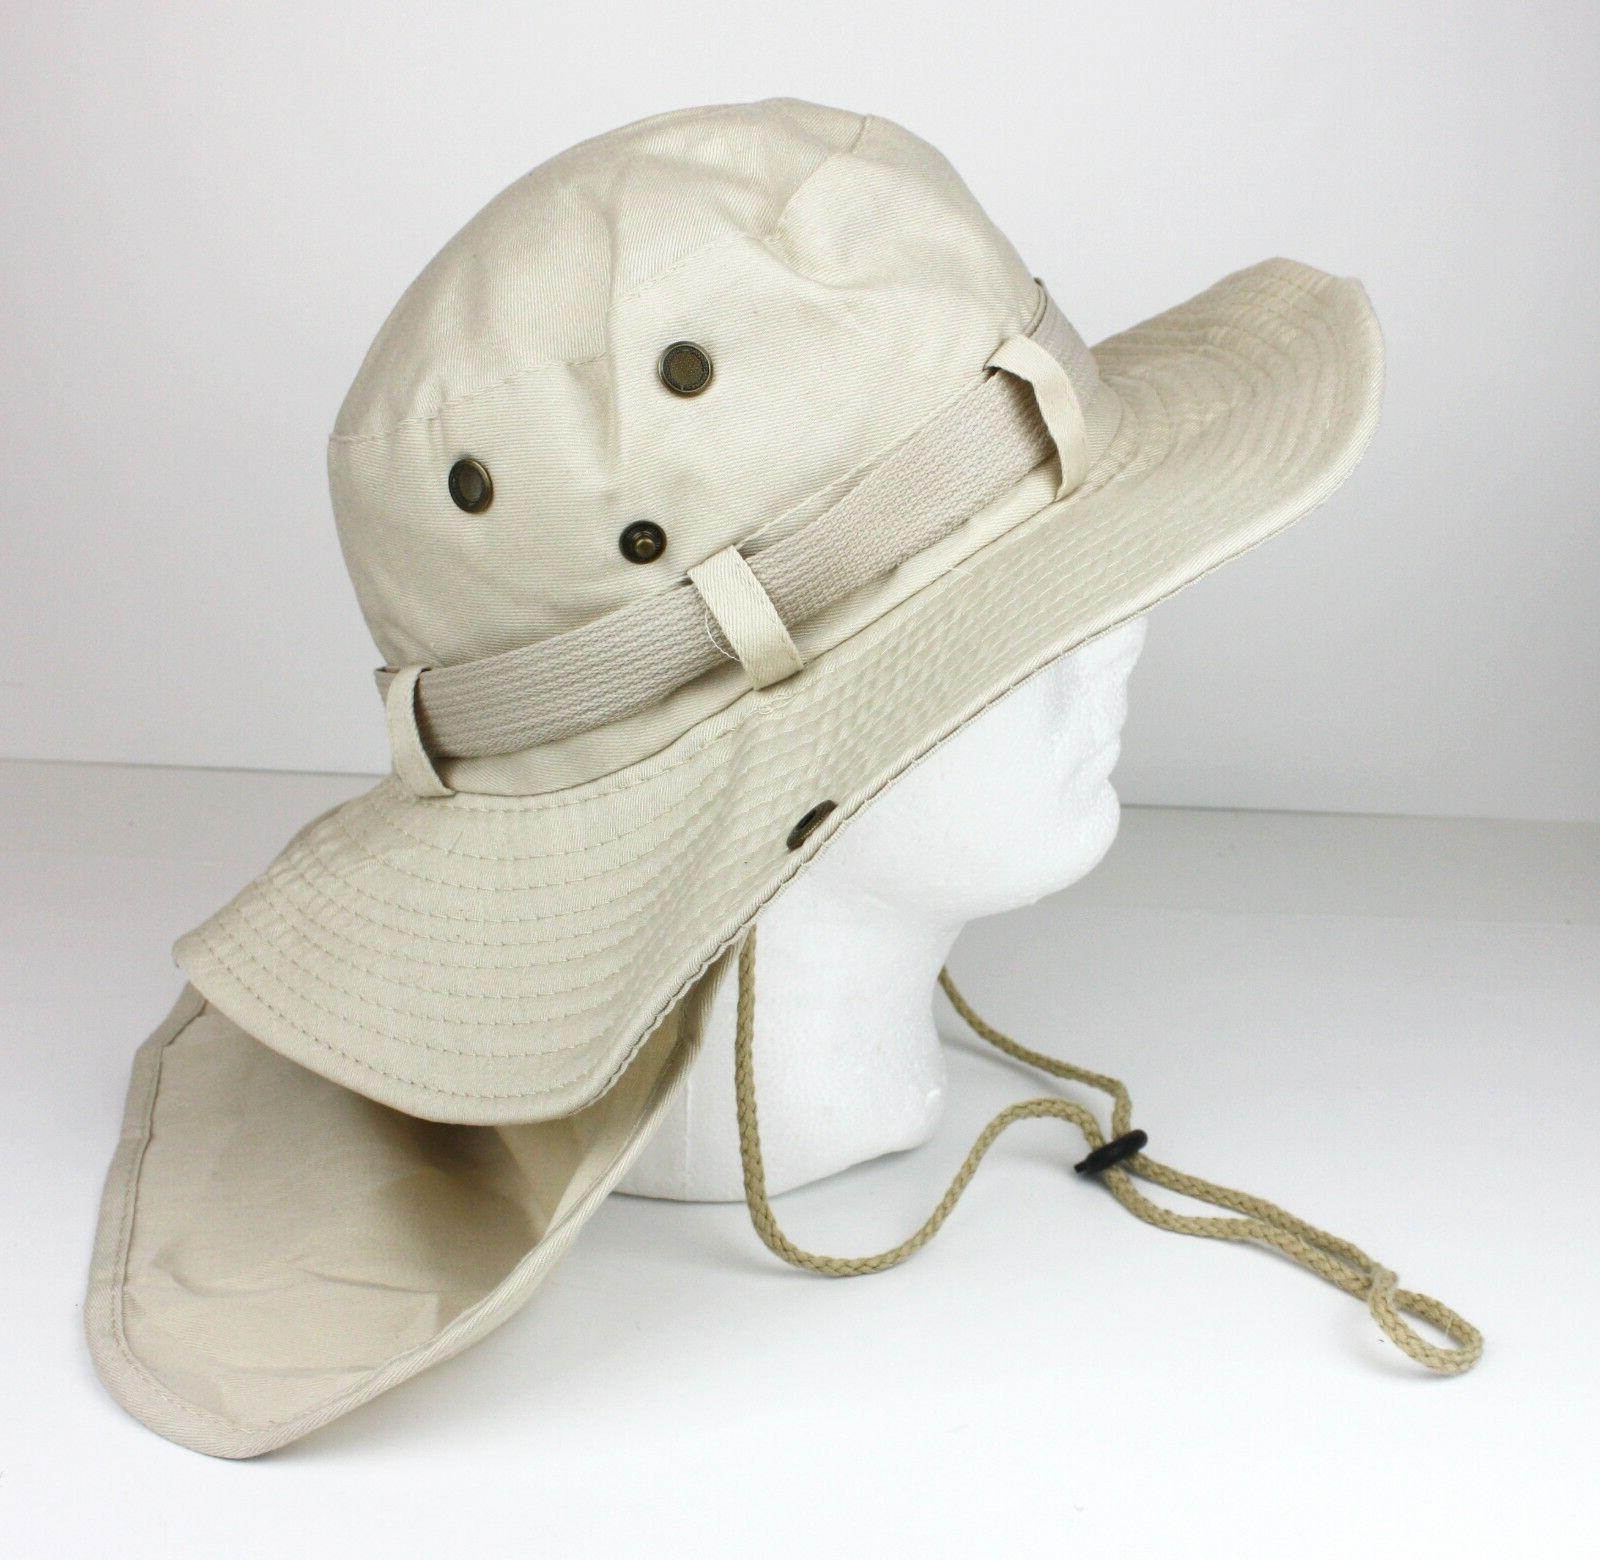 Boonie Neck Cover Hat Fishing Sun UV Summer Cap Men